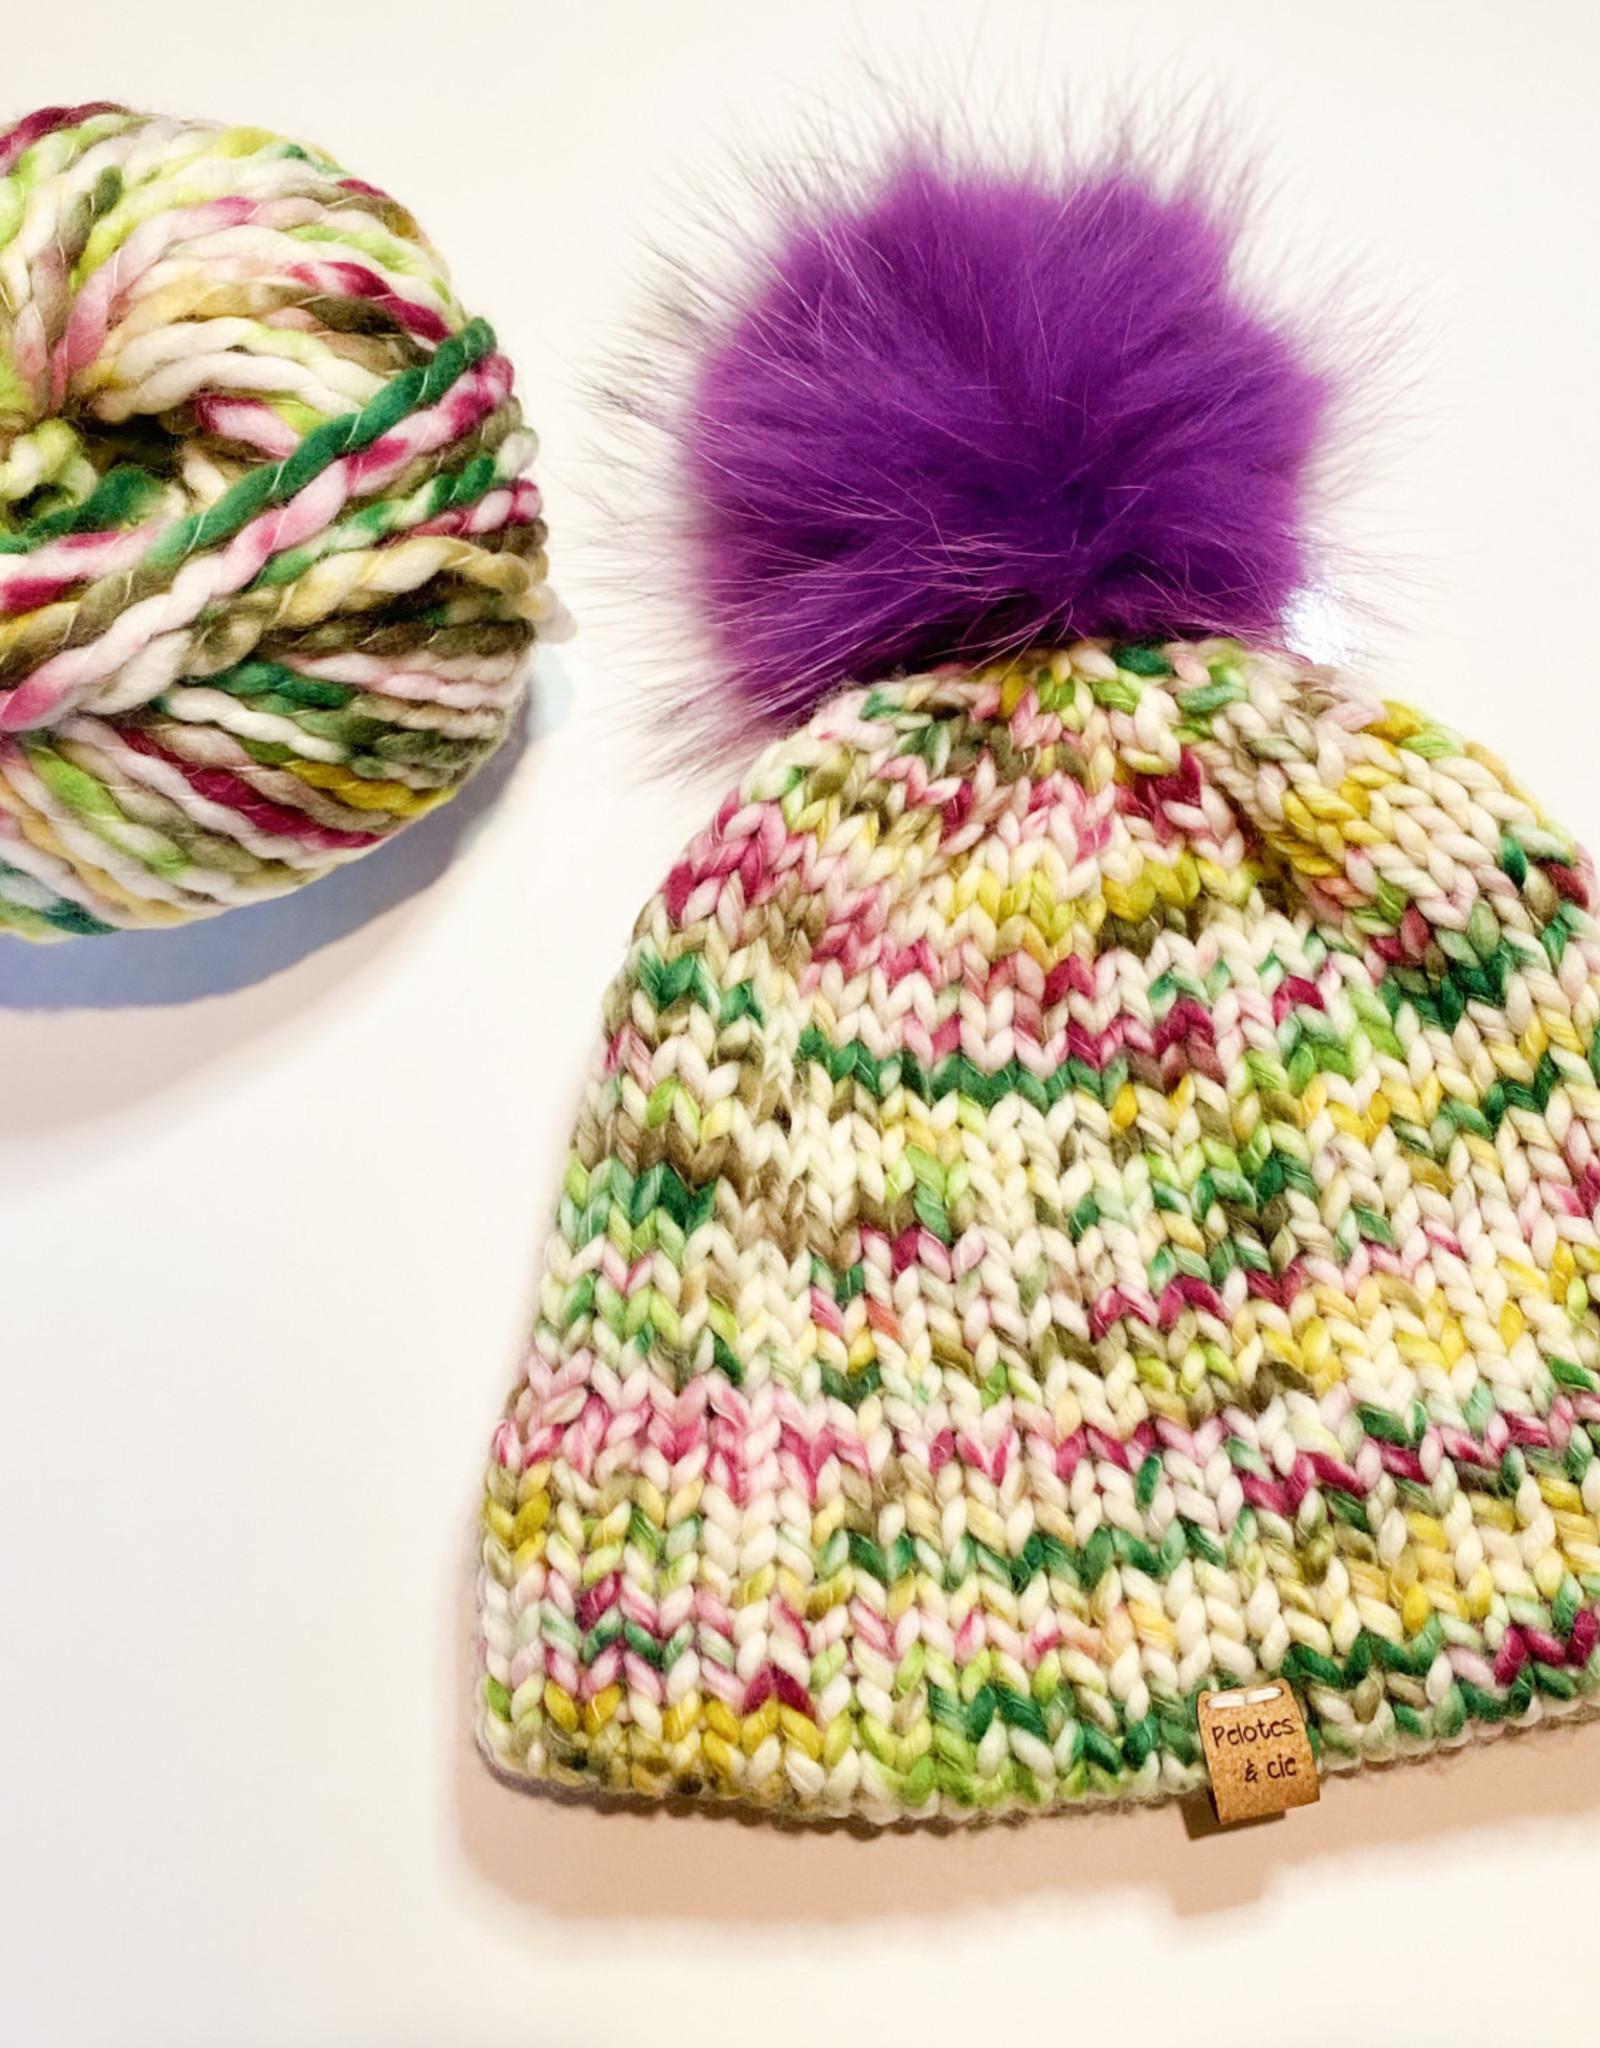 Pelotes & Cie Prêt-à-tricoter - Tuque Clover - Rosie